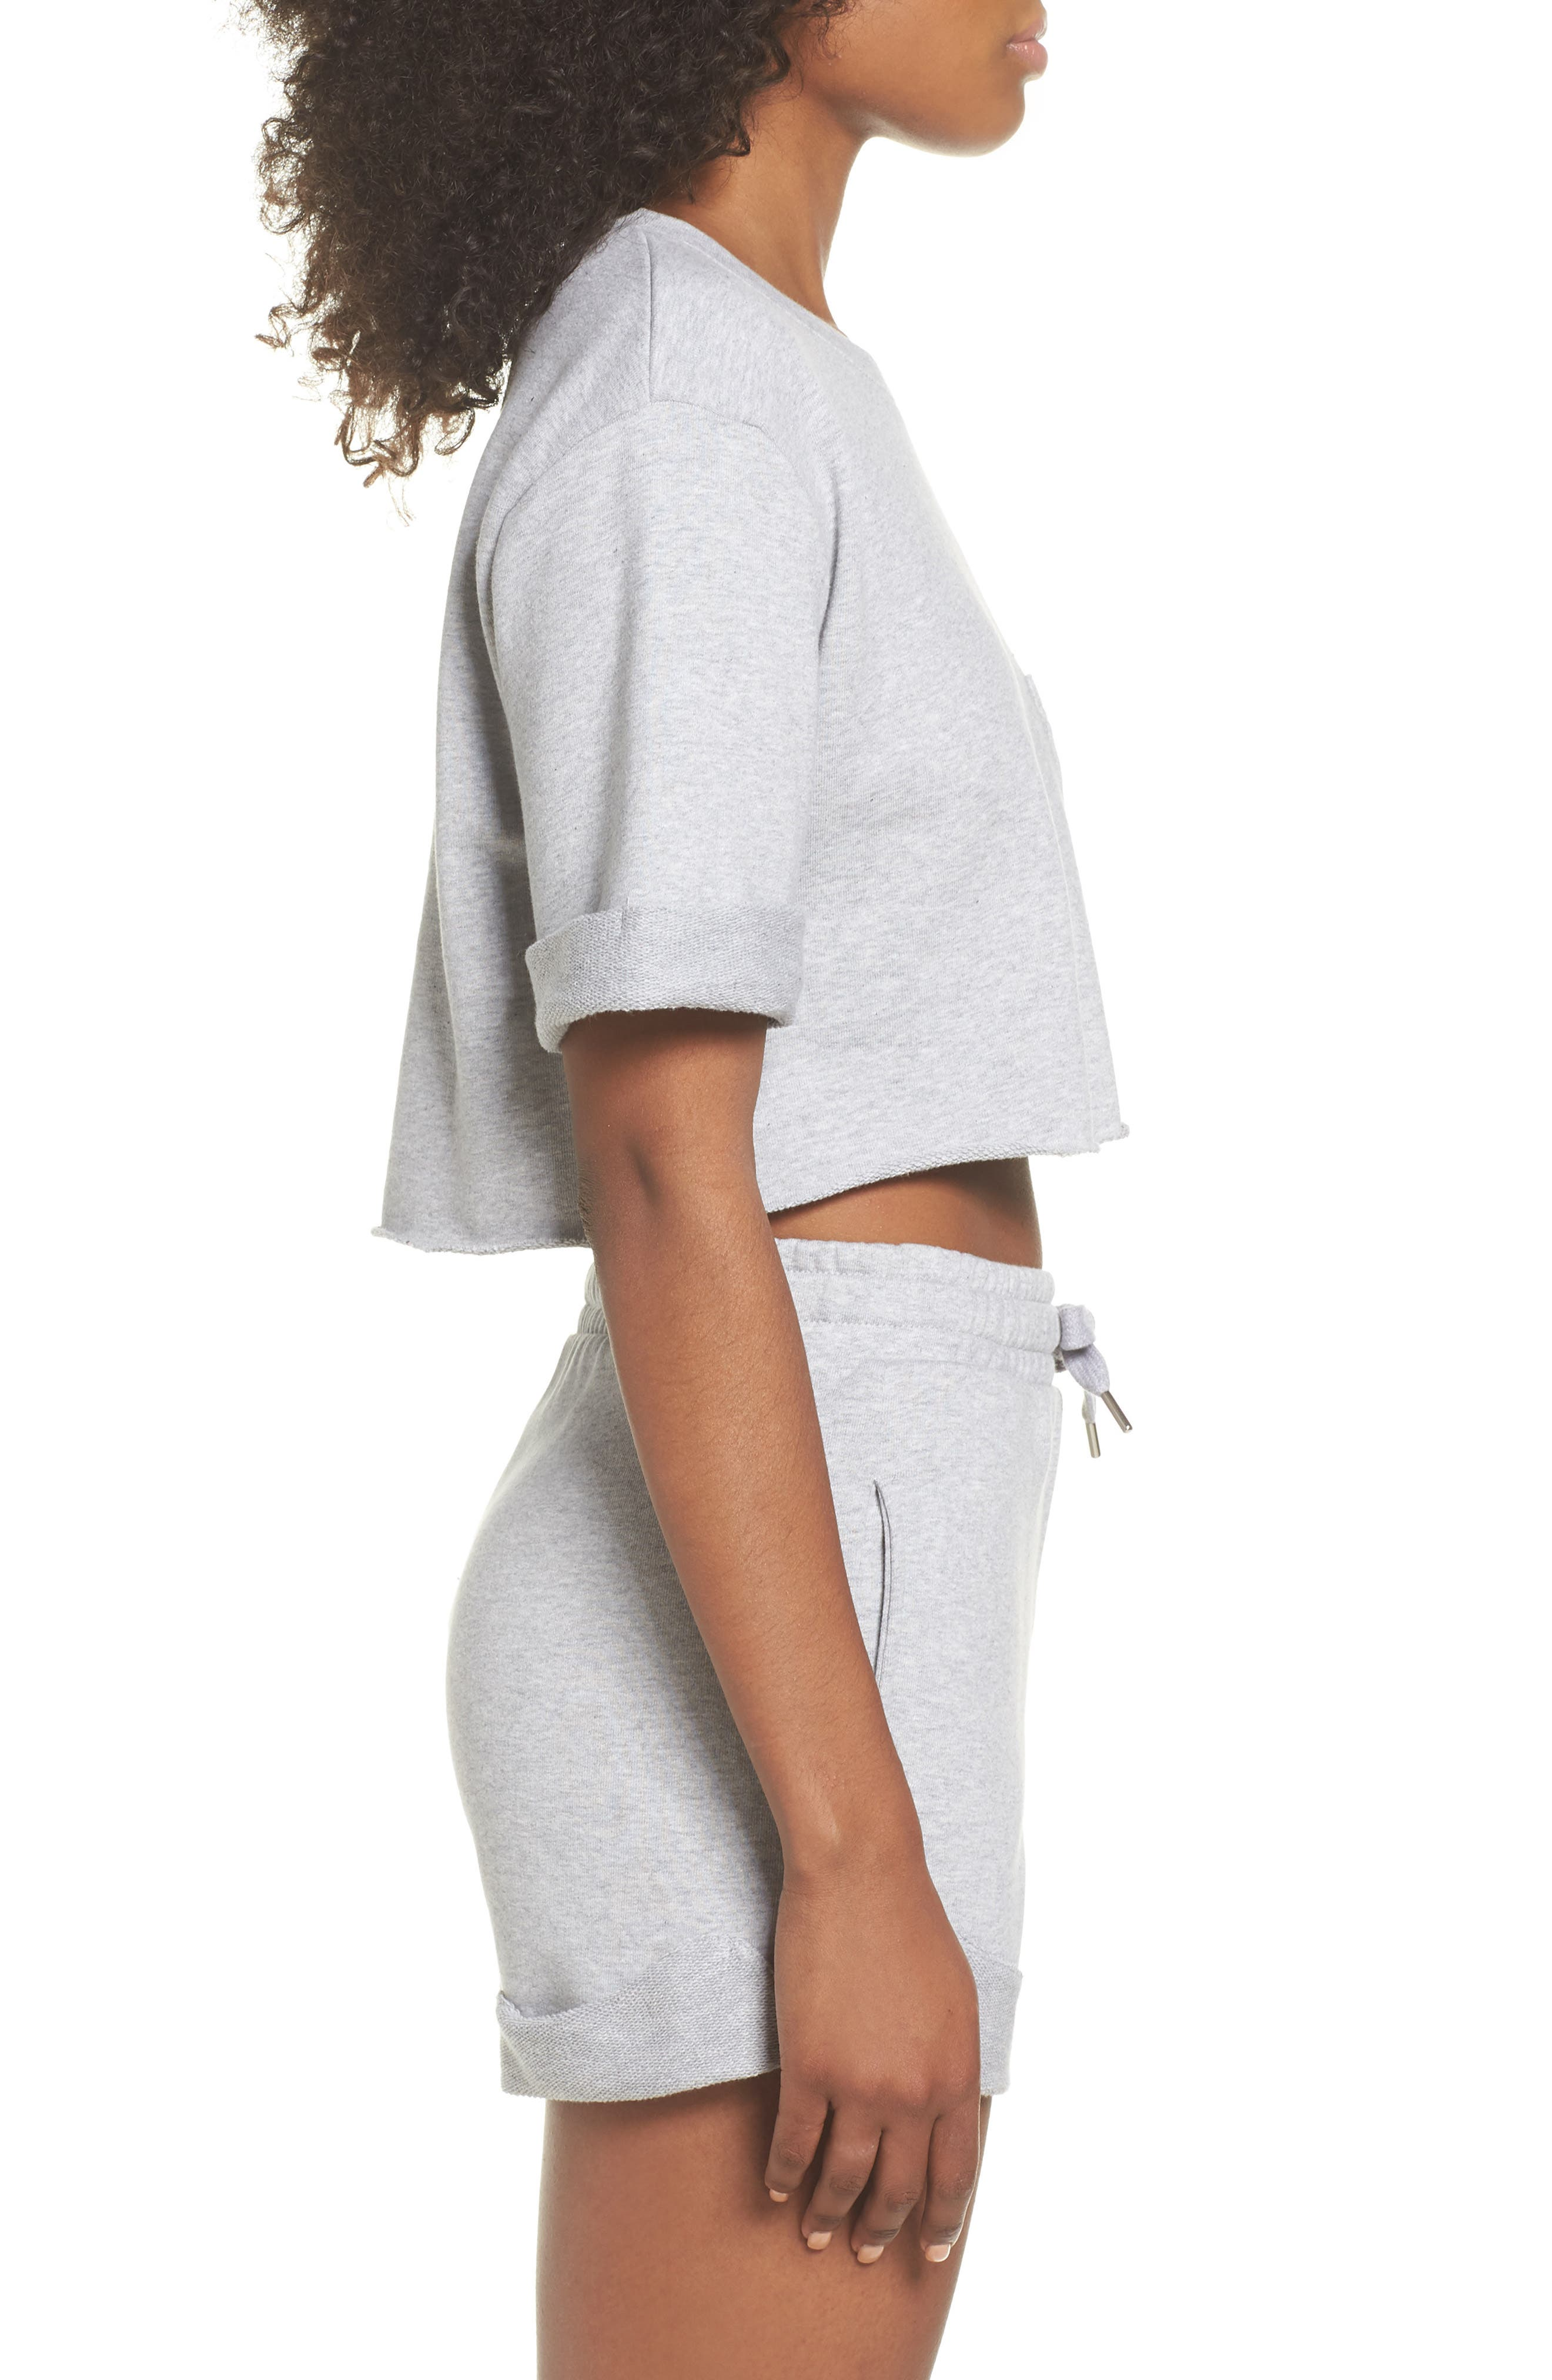 French Terry Crop Sweatshirt,                             Alternate thumbnail 3, color,                             Light Grey Marl